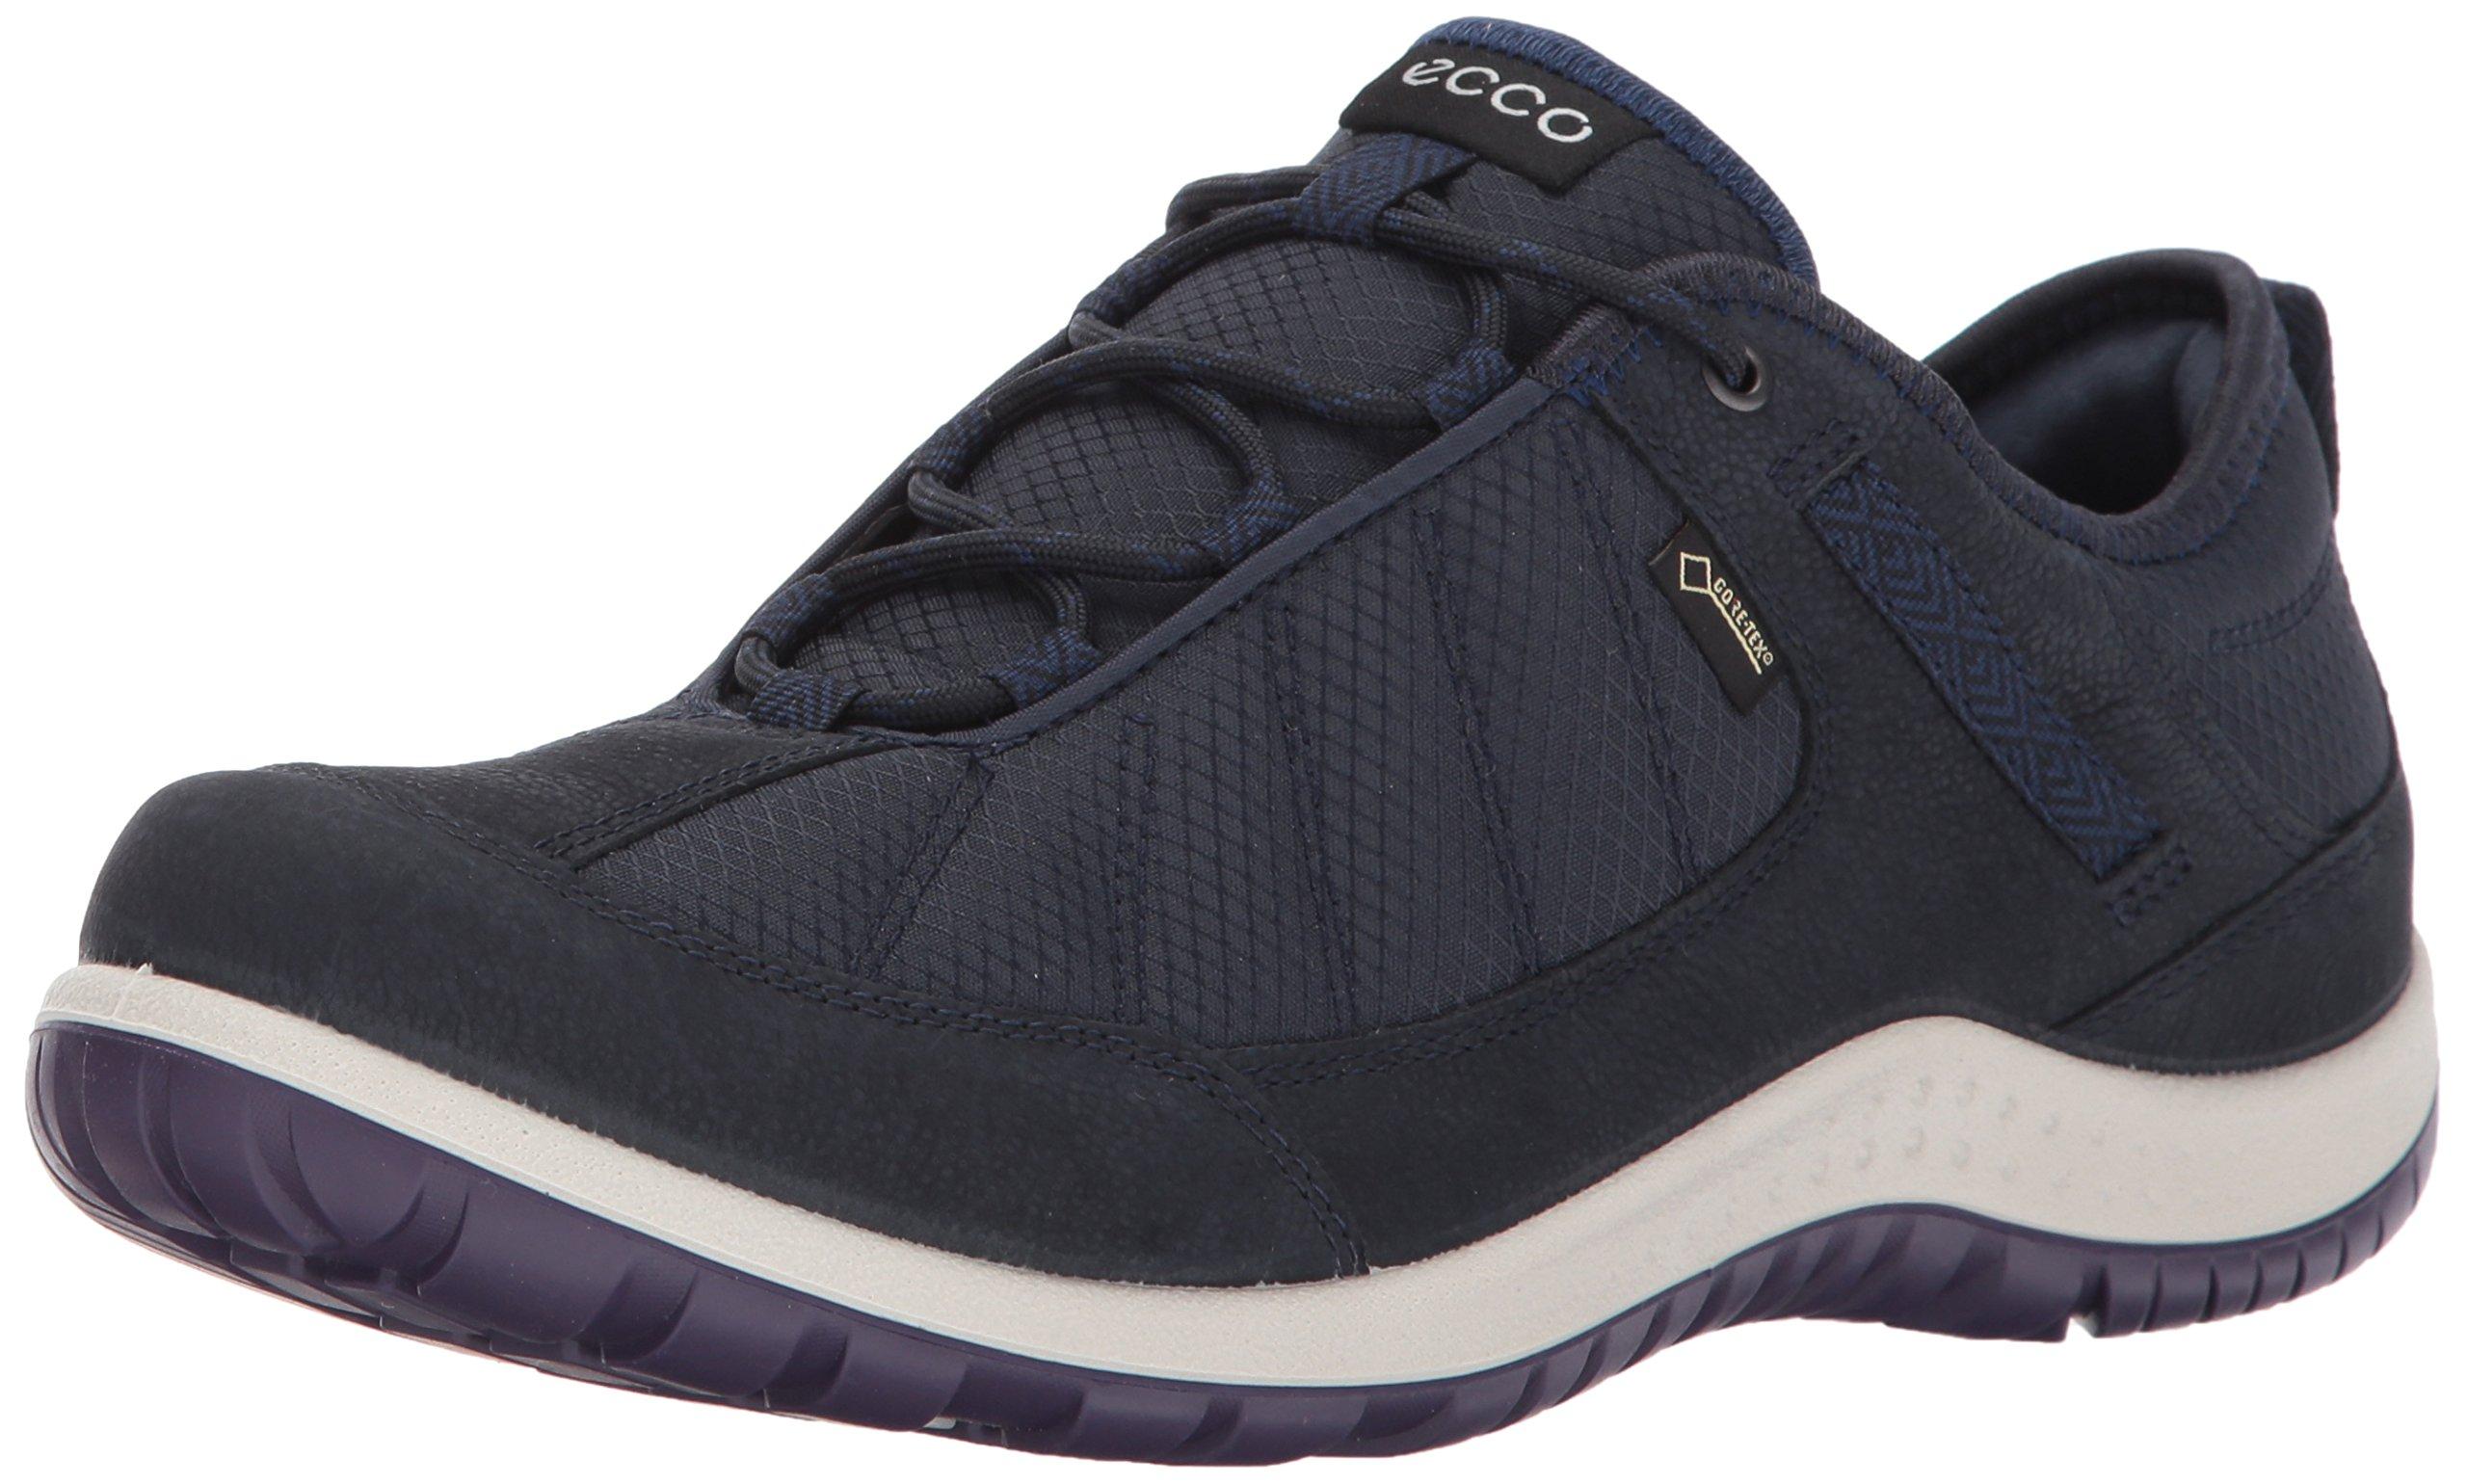 ECCO Women's Aspina Low Gore-Tex Textile Hiking Shoe, Navy/True Navy, 38 EU/7-7.5 US